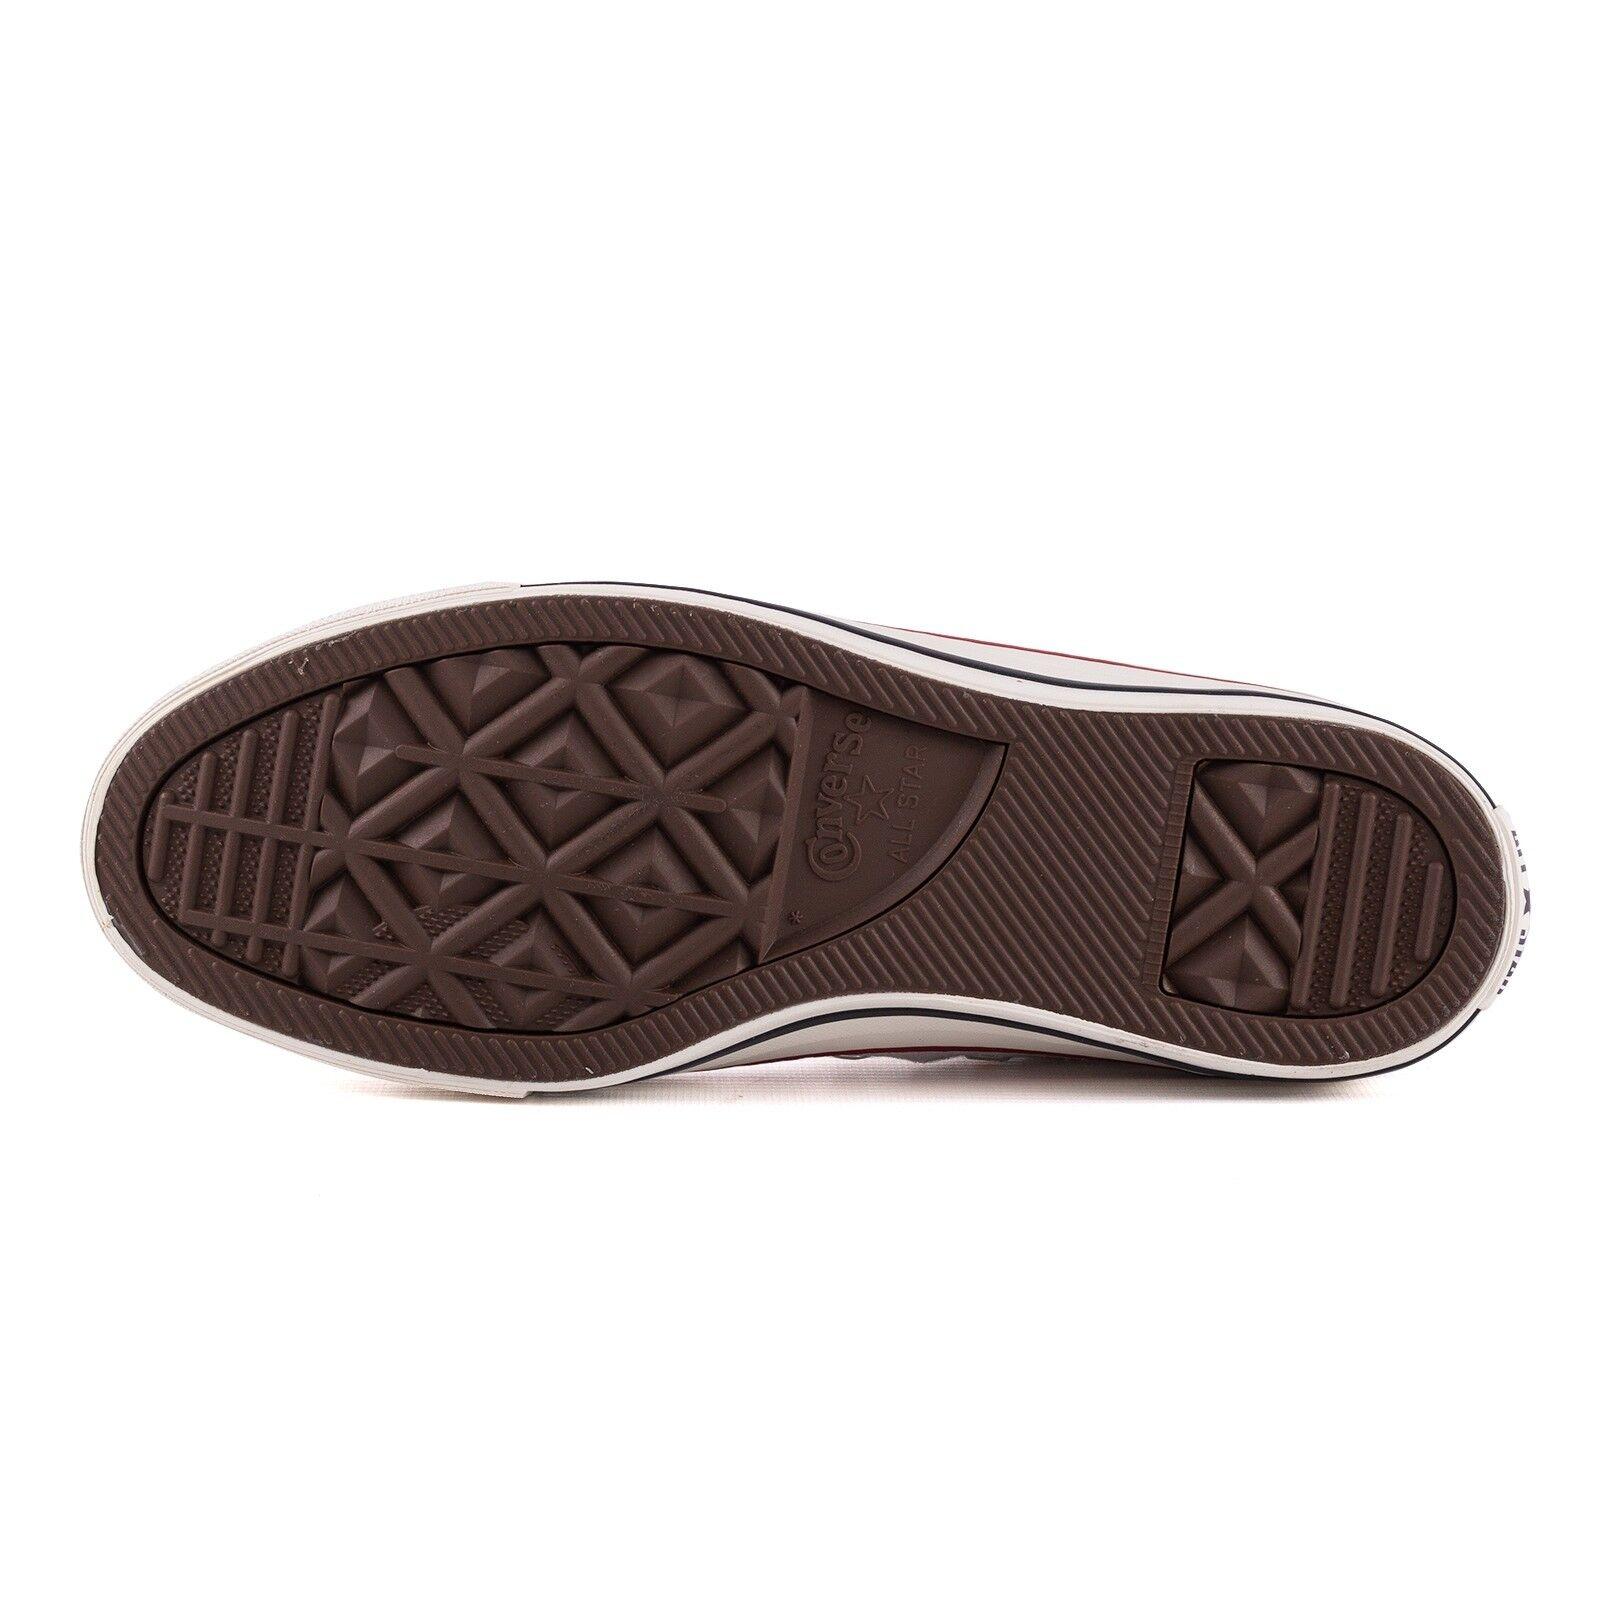 Converse señora ctas Ox zapatos señora Converse zapato cortos Weiss 51431 a7af88